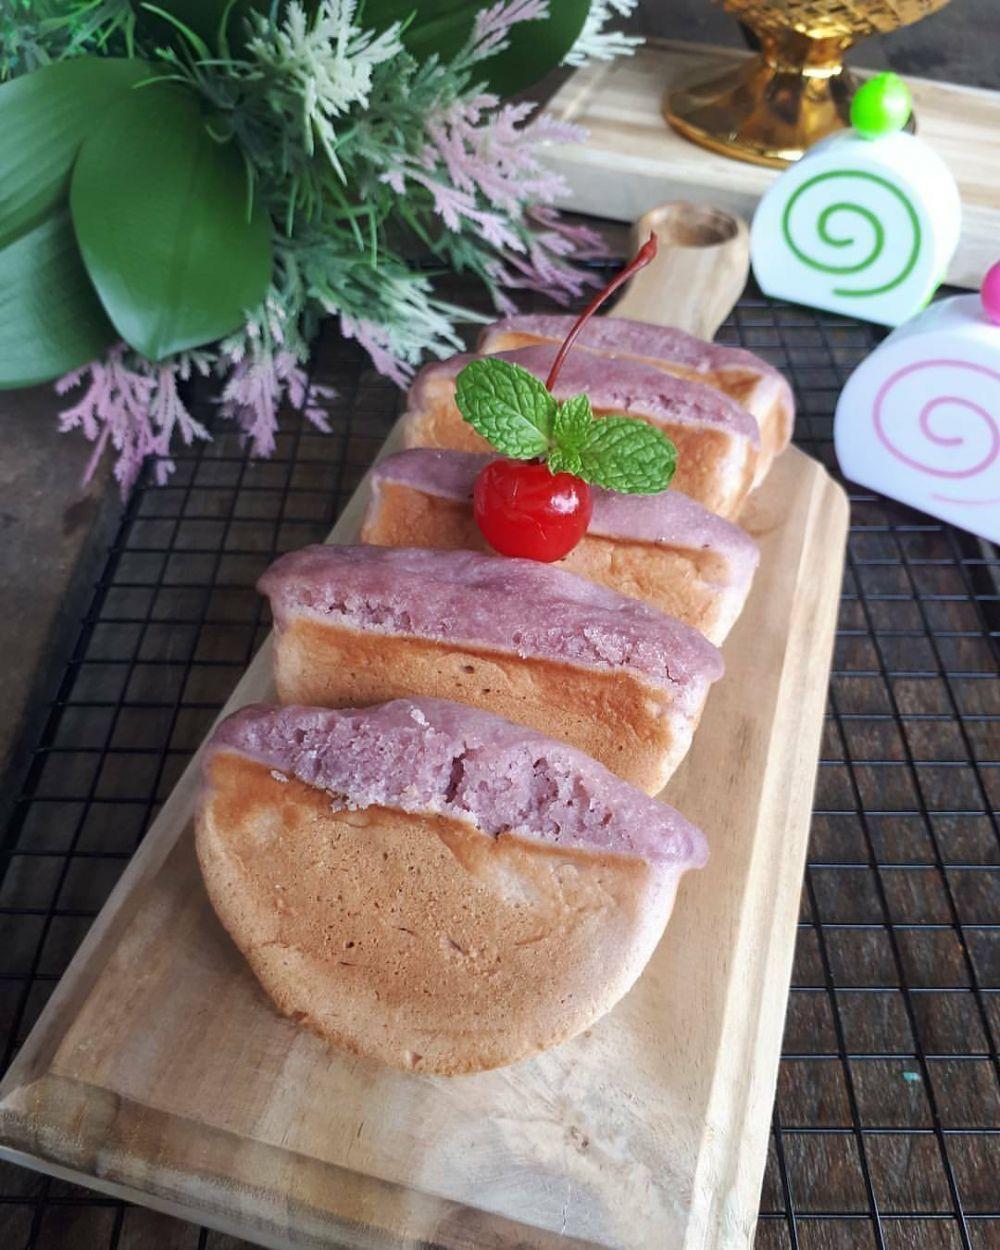 Resep Kue Pukis Enak Instagram Numpangsaveresep Id Berbururesep Resep Kue Makanan Resep